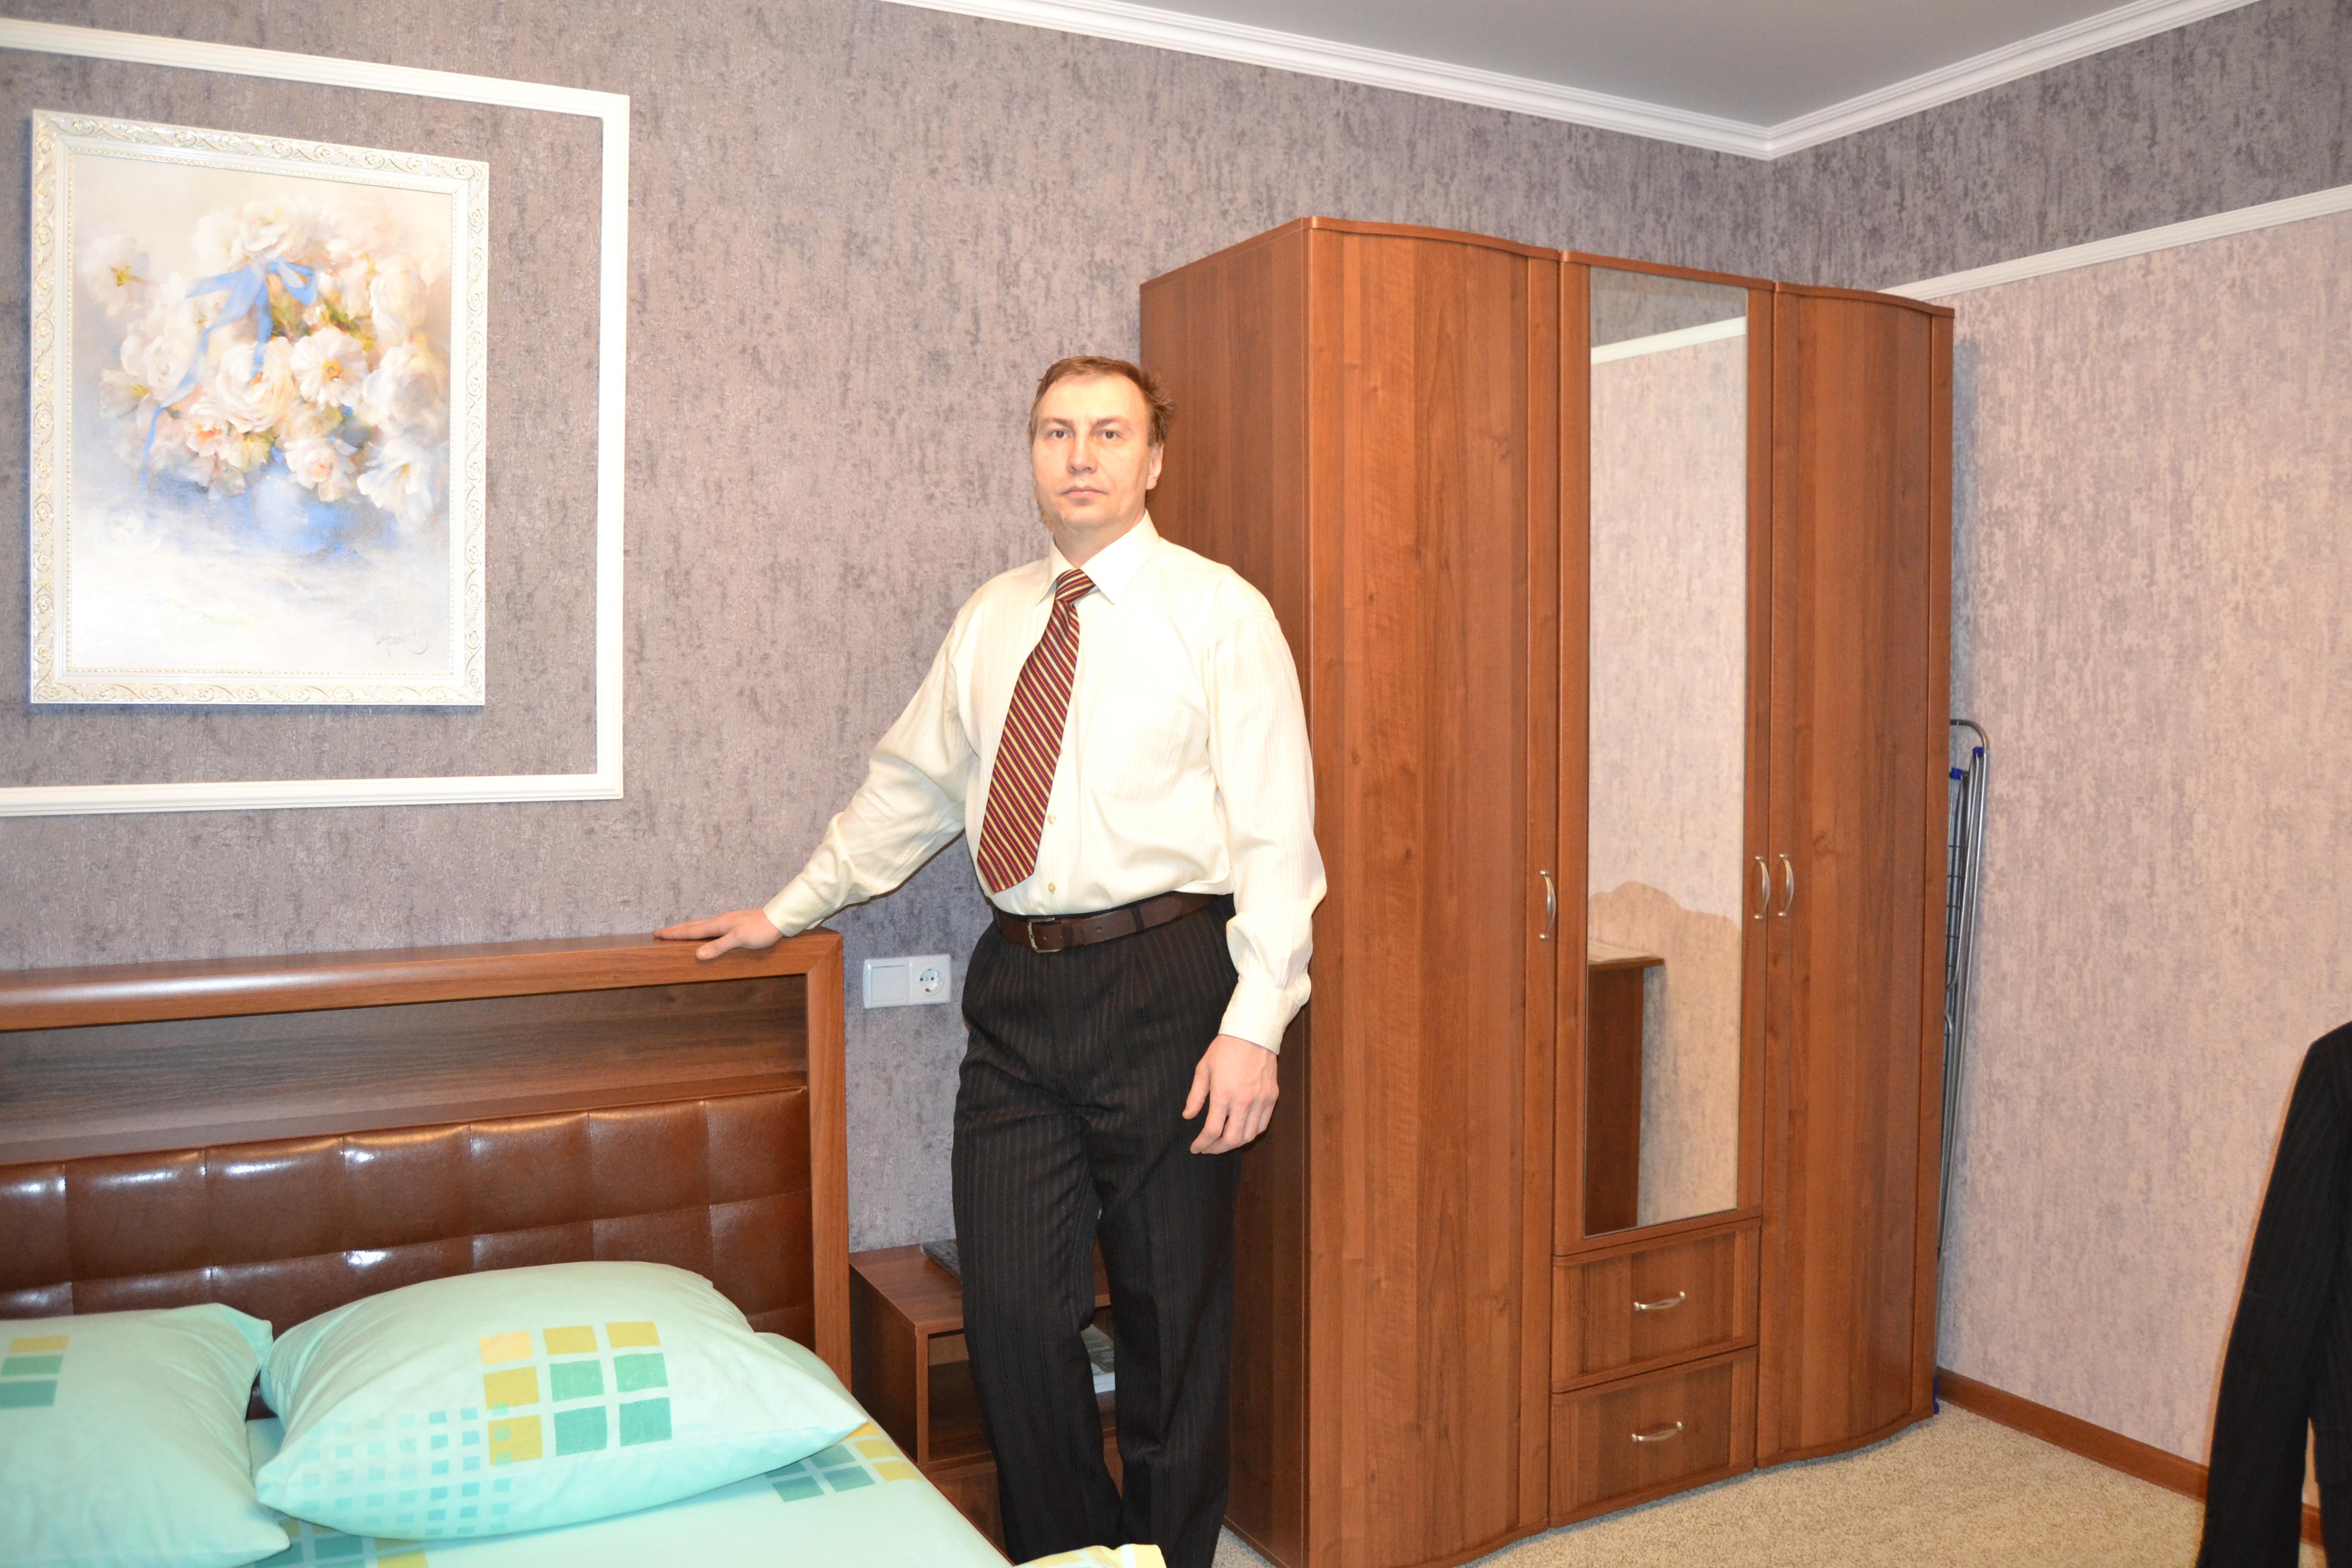 Номер гостиницы Нижнекамска - Абсолют